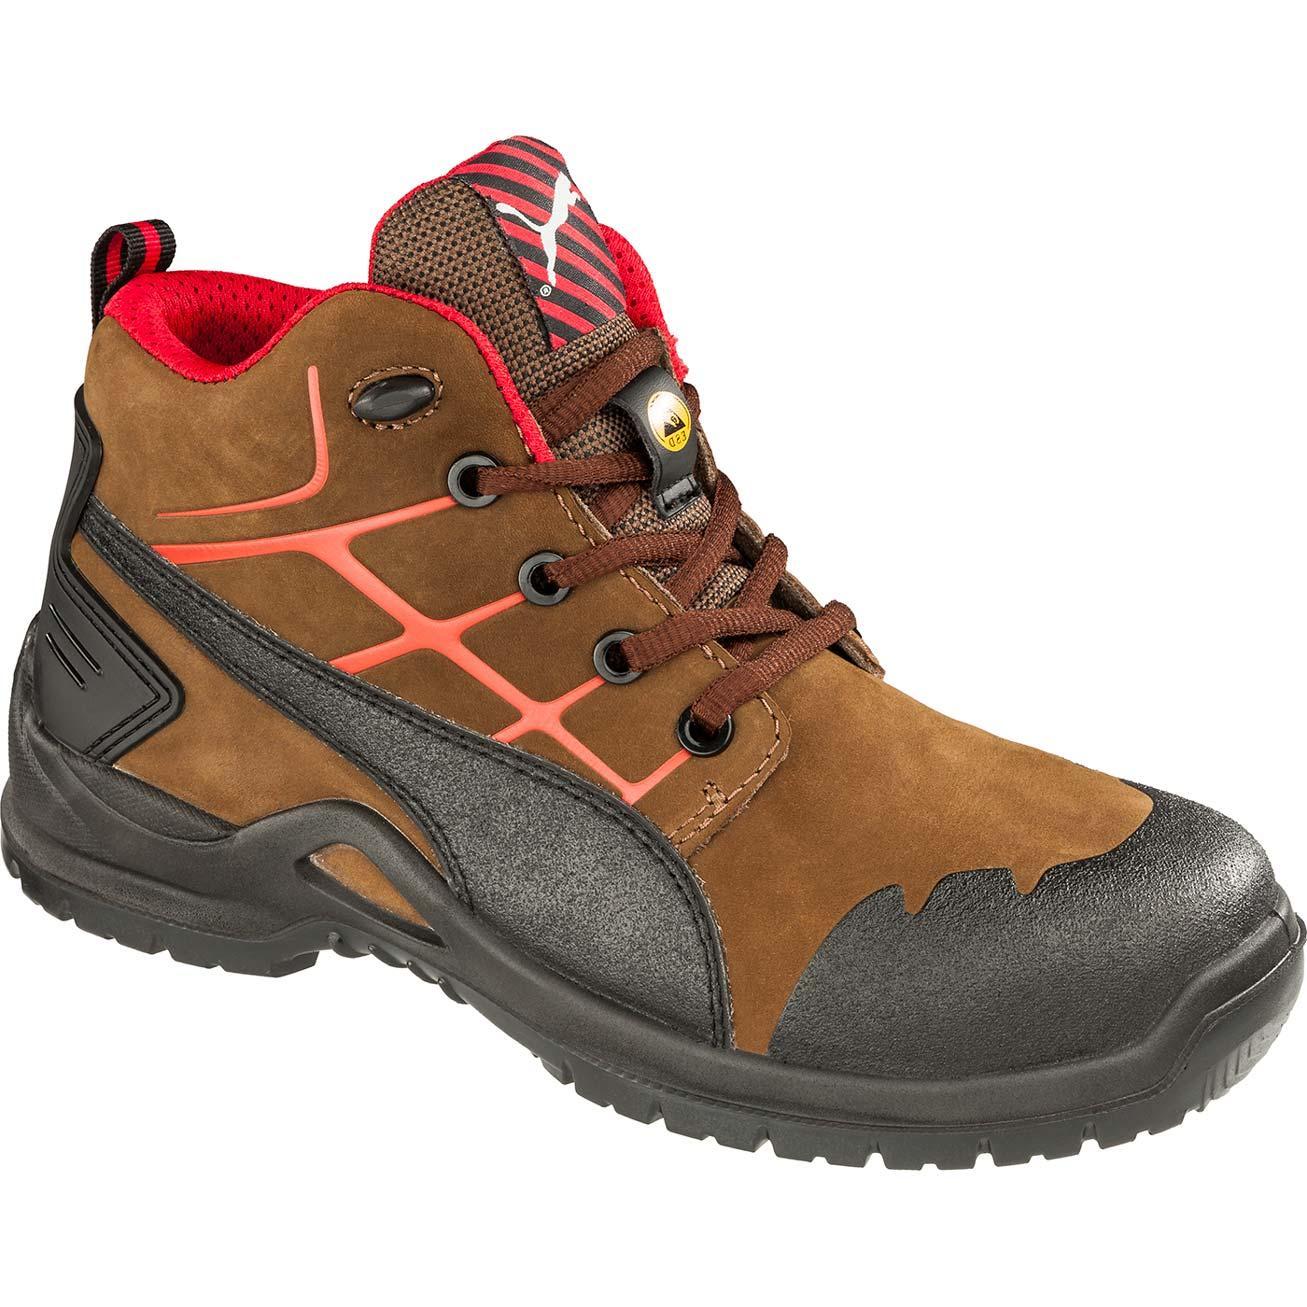 Puma Safety Shoes Size Chart